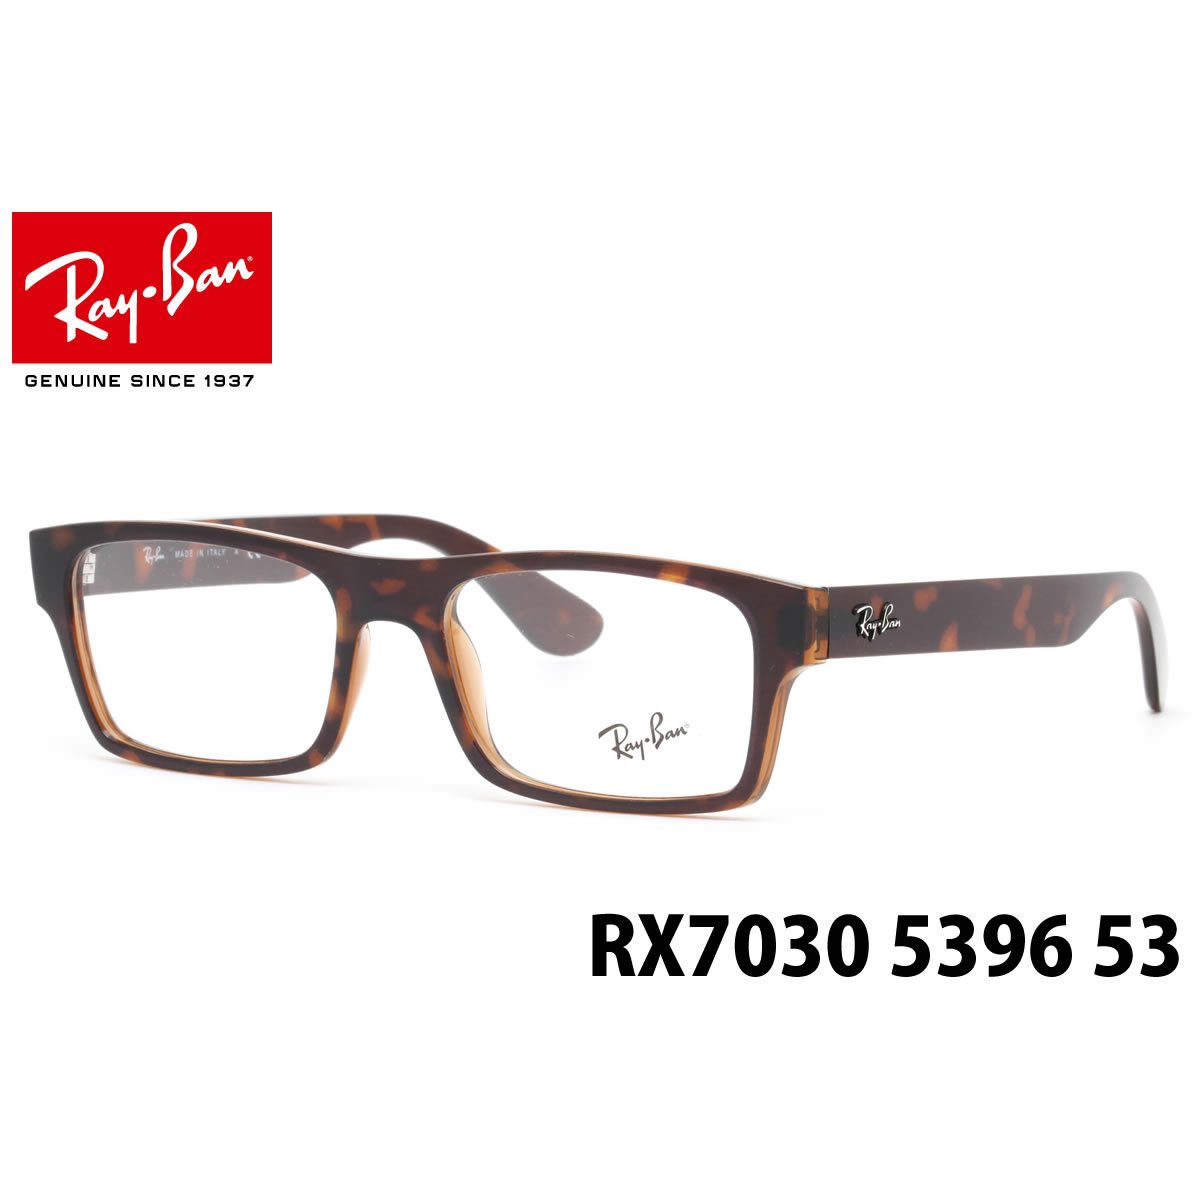 4d12e9e804 12 d7c07 2b925  australia ray ban glasses frames rx7030 5396 53 size ray  ban rayban mens womens 50a0a d3c46